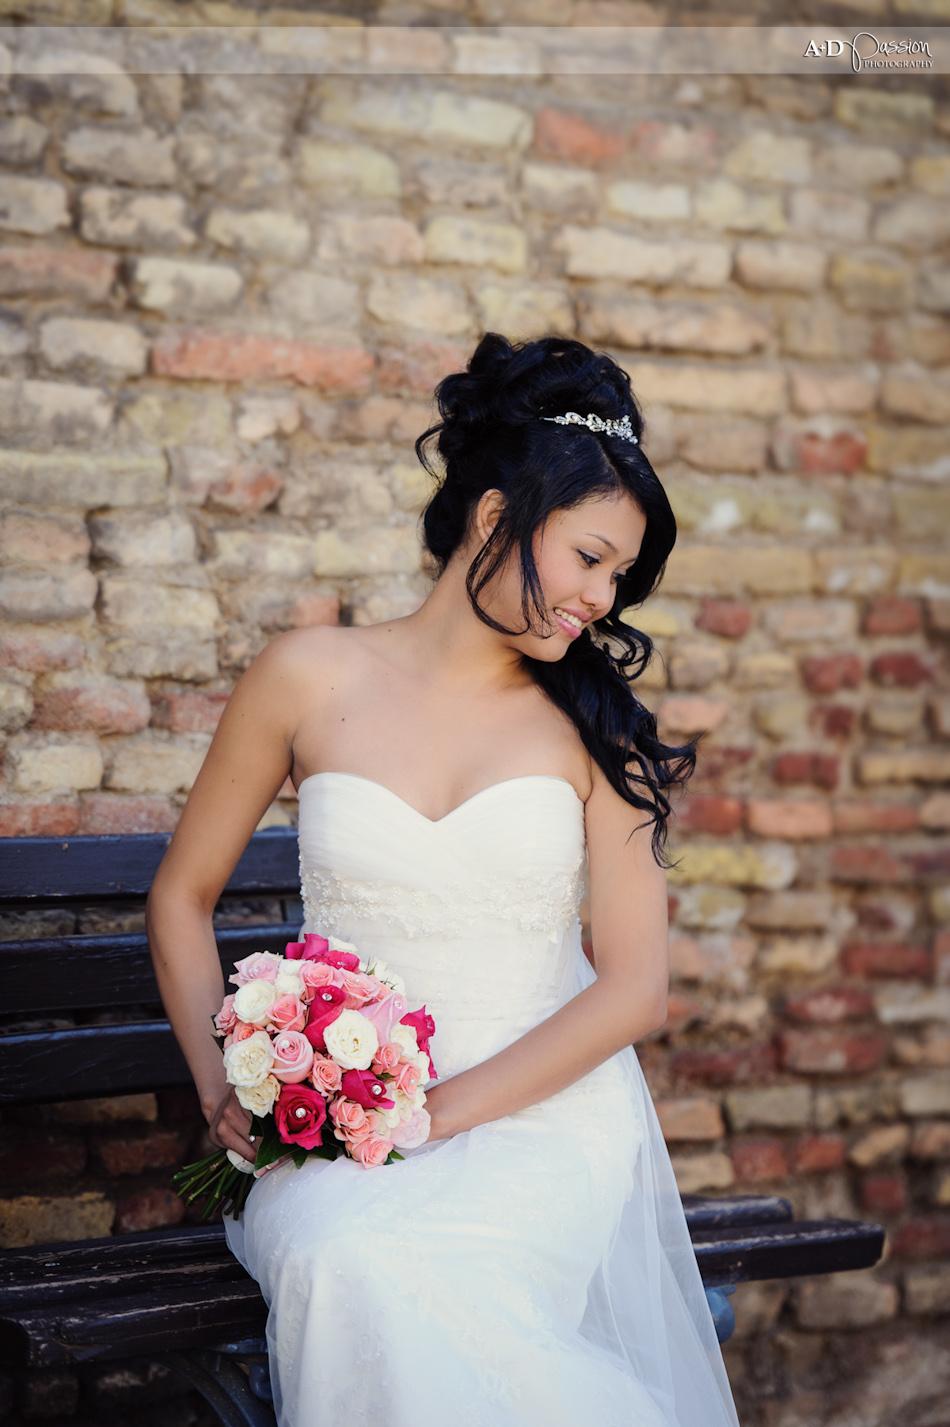 AD Passion Photography | 20120930_Gabriel&Iveth_Fotograf-profesionist-nunta_Nunta-Zaragoza-Spania_0023 | Adelin, Dida, fotograf profesionist, fotograf de nunta, fotografie de nunta, fotograf Timisoara, fotograf Craiova, fotograf Bucuresti, fotograf Arad, nunta Timisoara, nunta Arad, nunta Bucuresti, nunta Craiova